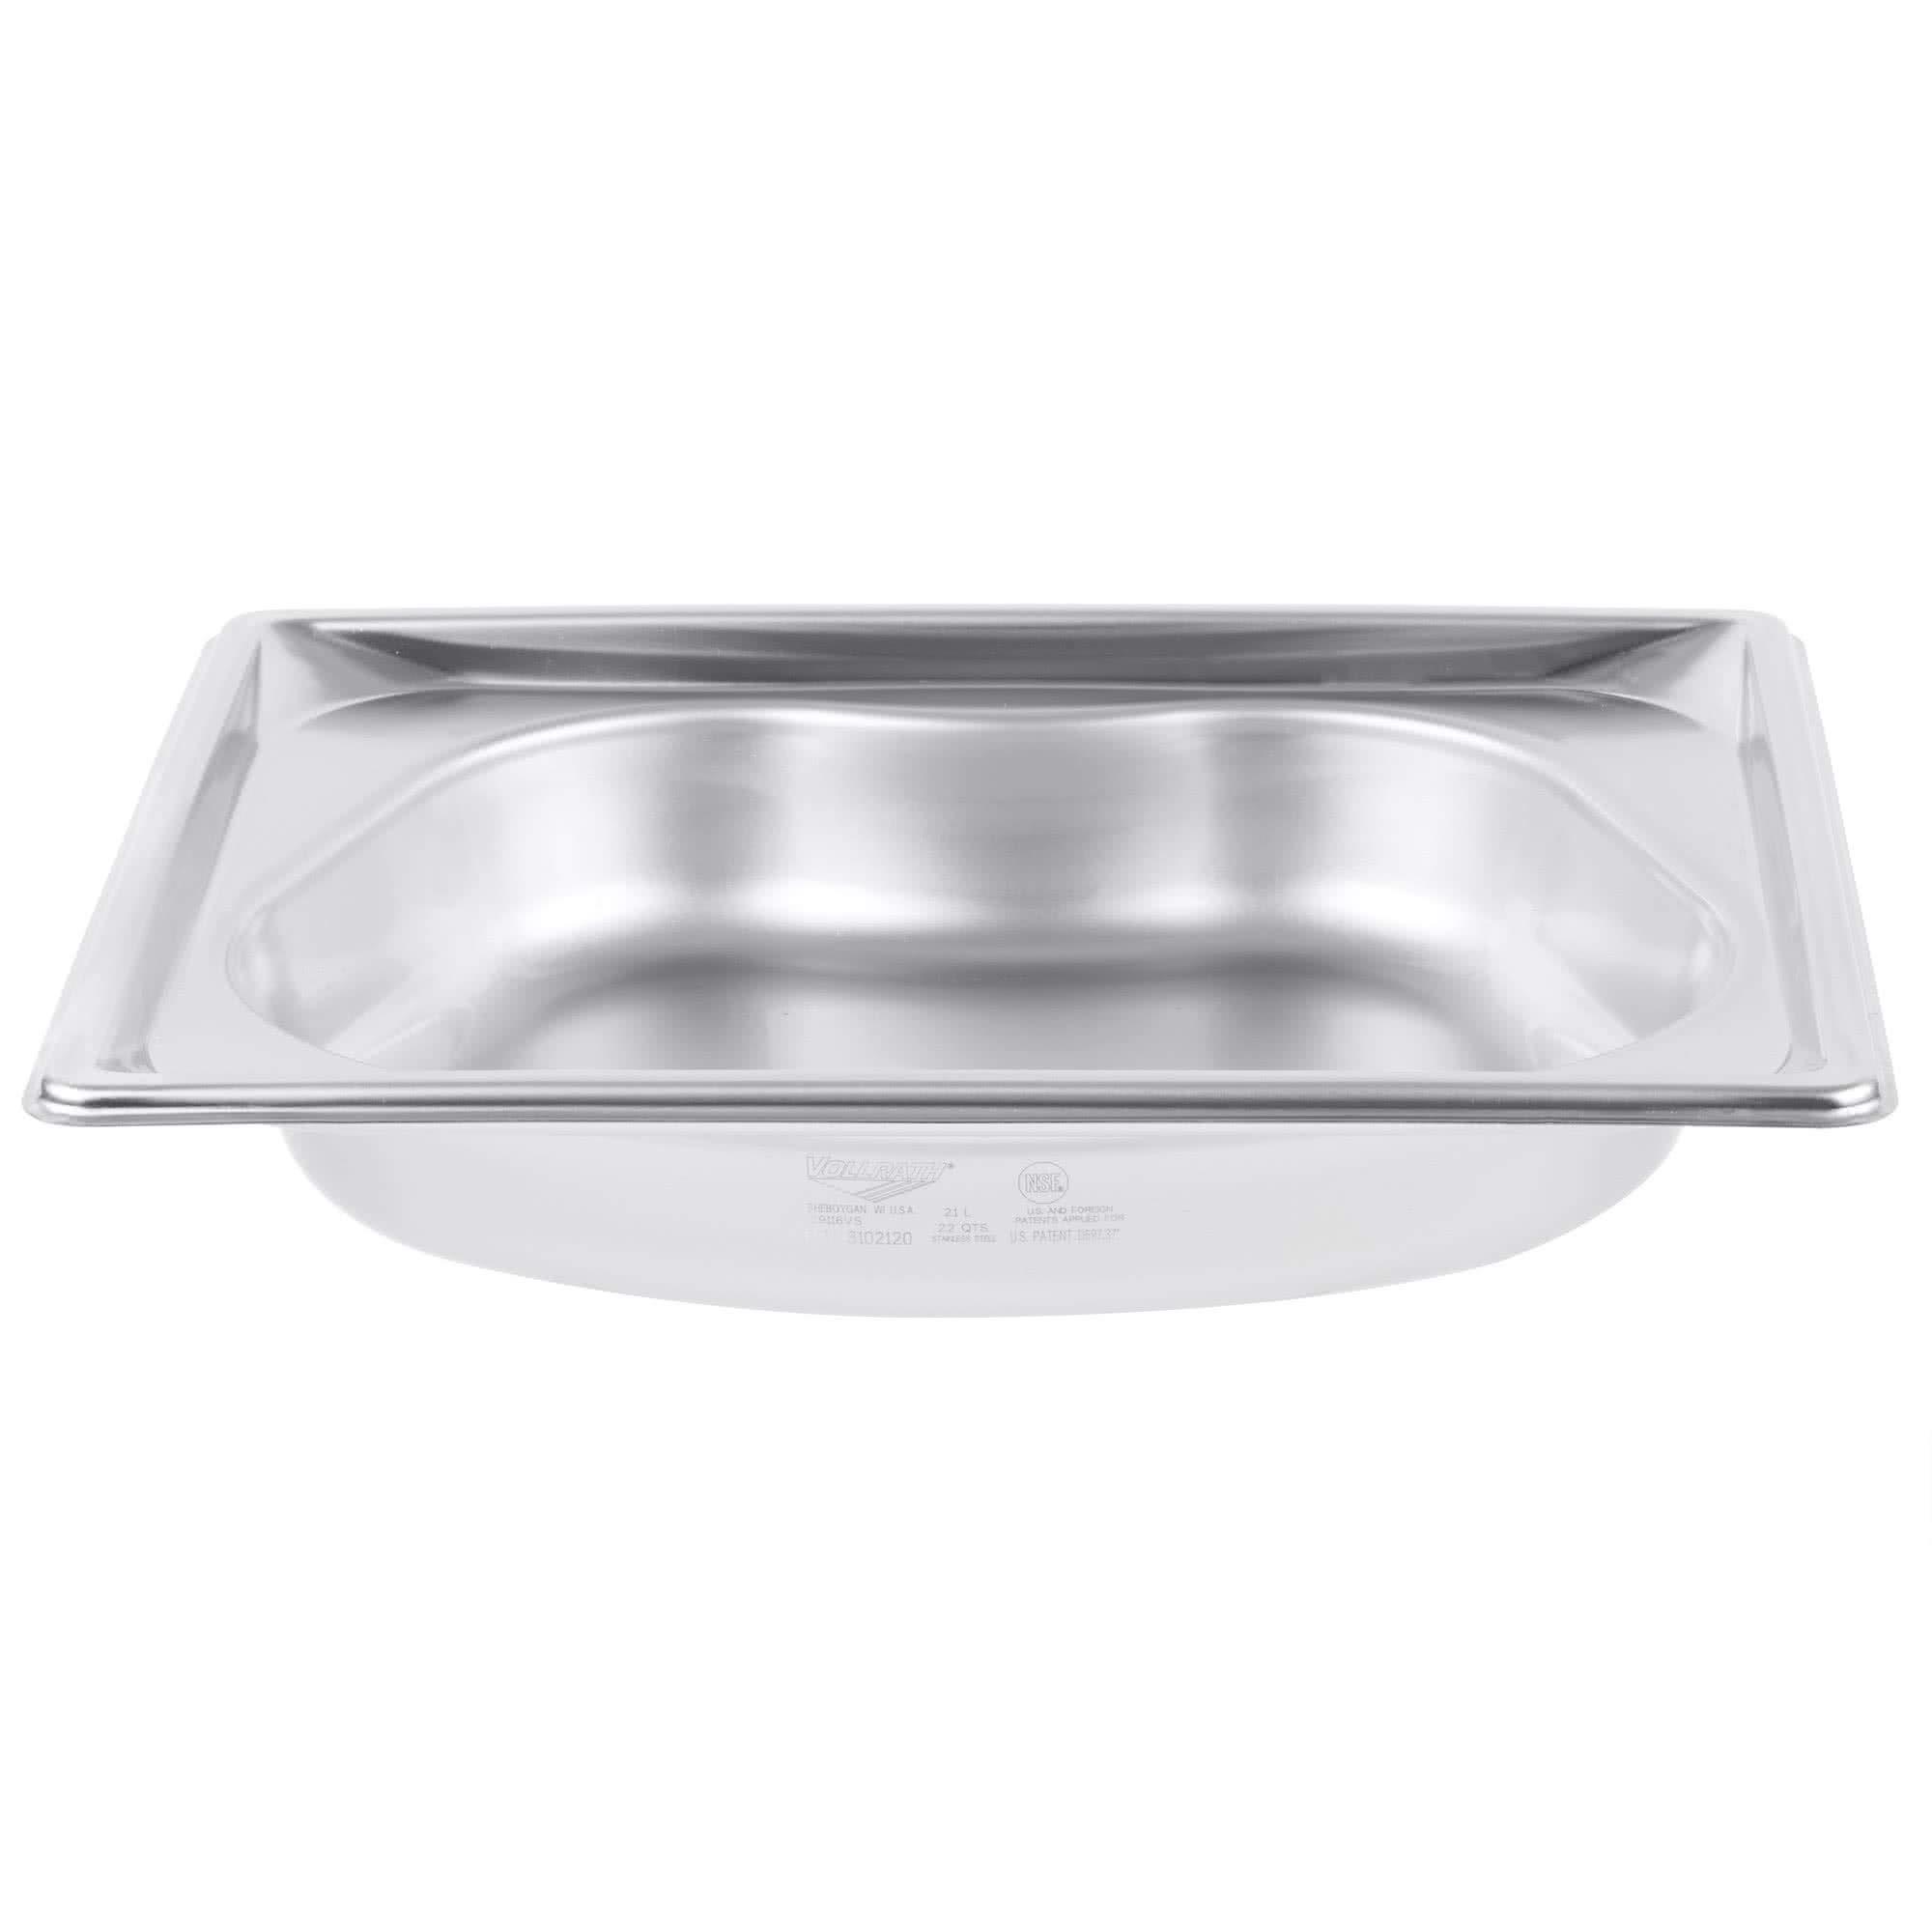 TableTop King 3102120 Super Pan 2 1/2'' Deep Super Shape Half Size Kidney Pan by TableTop King